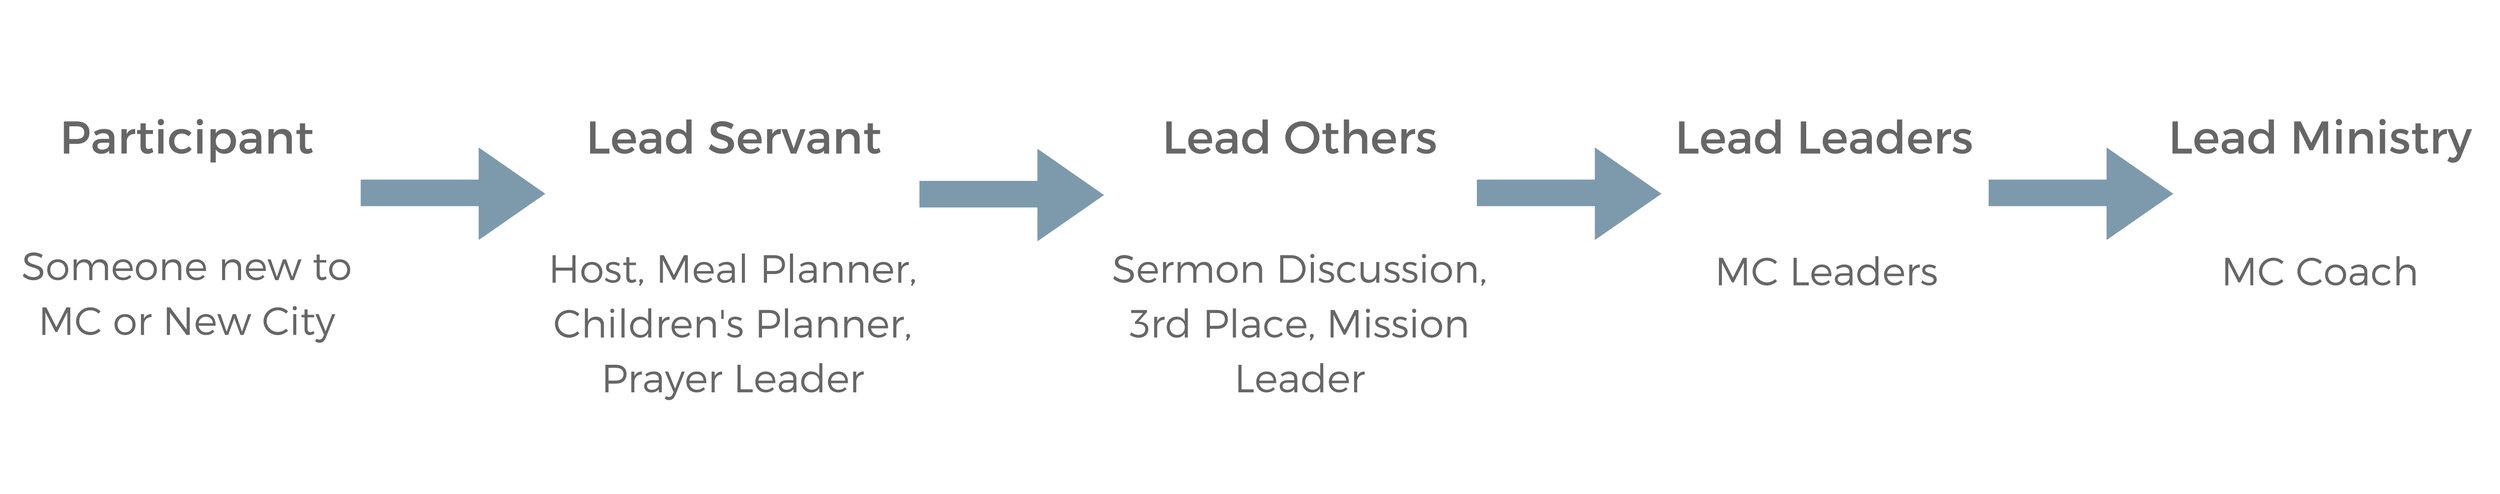 MC Leadership Pipeline.jpg